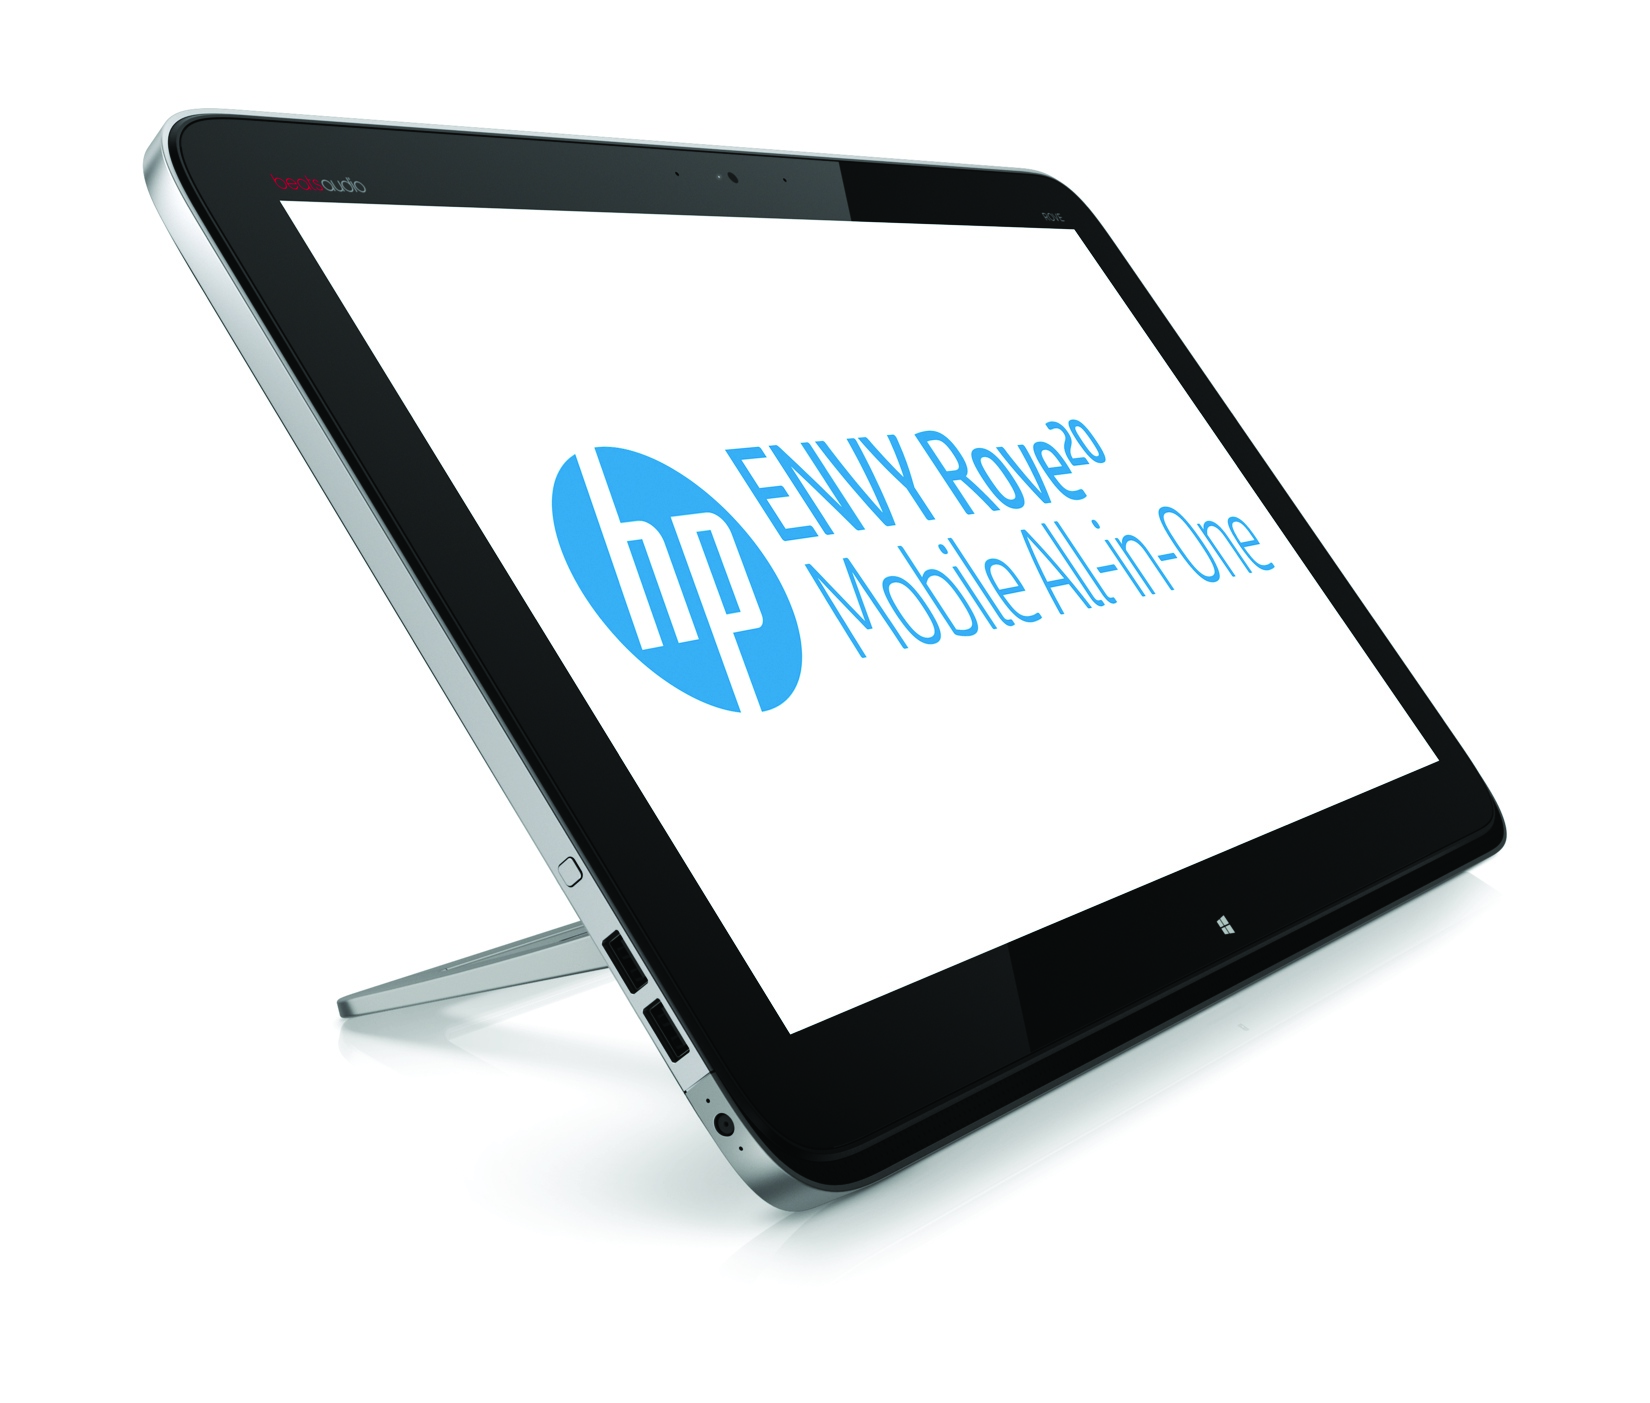 Настольный компьютер HP T620 F5A51AA (AMD GX-217GA 1.65 GHz/4096Mb/16Gb Flash/16Gb SSD/AMD Radeon HD8280E/HP ThinPro 32)